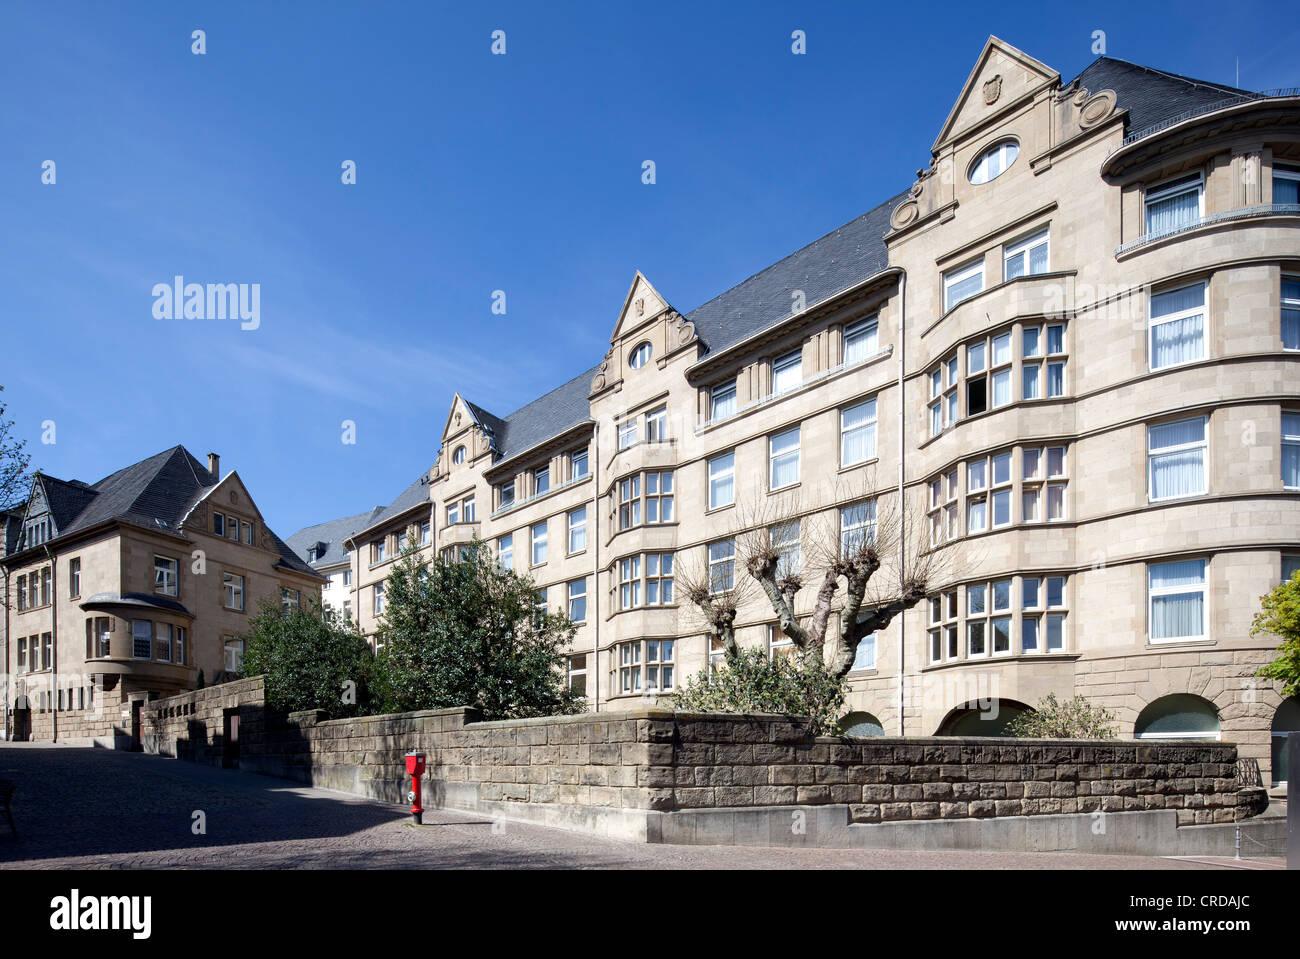 Landesbad, historic spa, clinic for rheumatology, Burtscheid district, Aachen, North Rhine-Westphalia, PublicGround - Stock Image